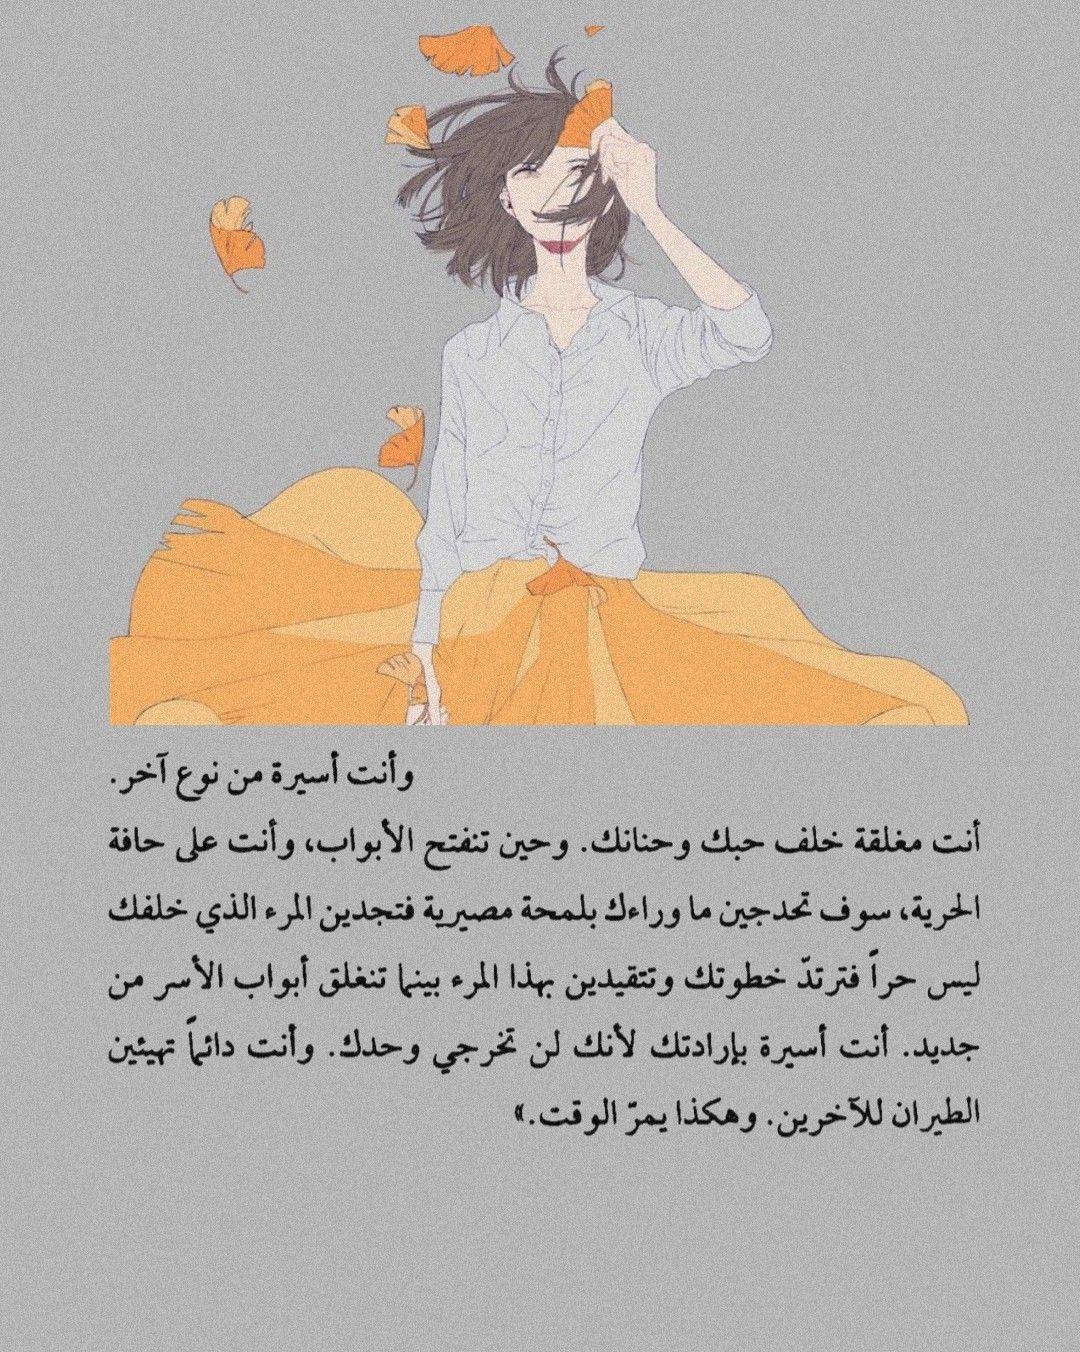 تحت الج رس الز جاجي أناييس نن Arabic Funny Disney Characters Funny